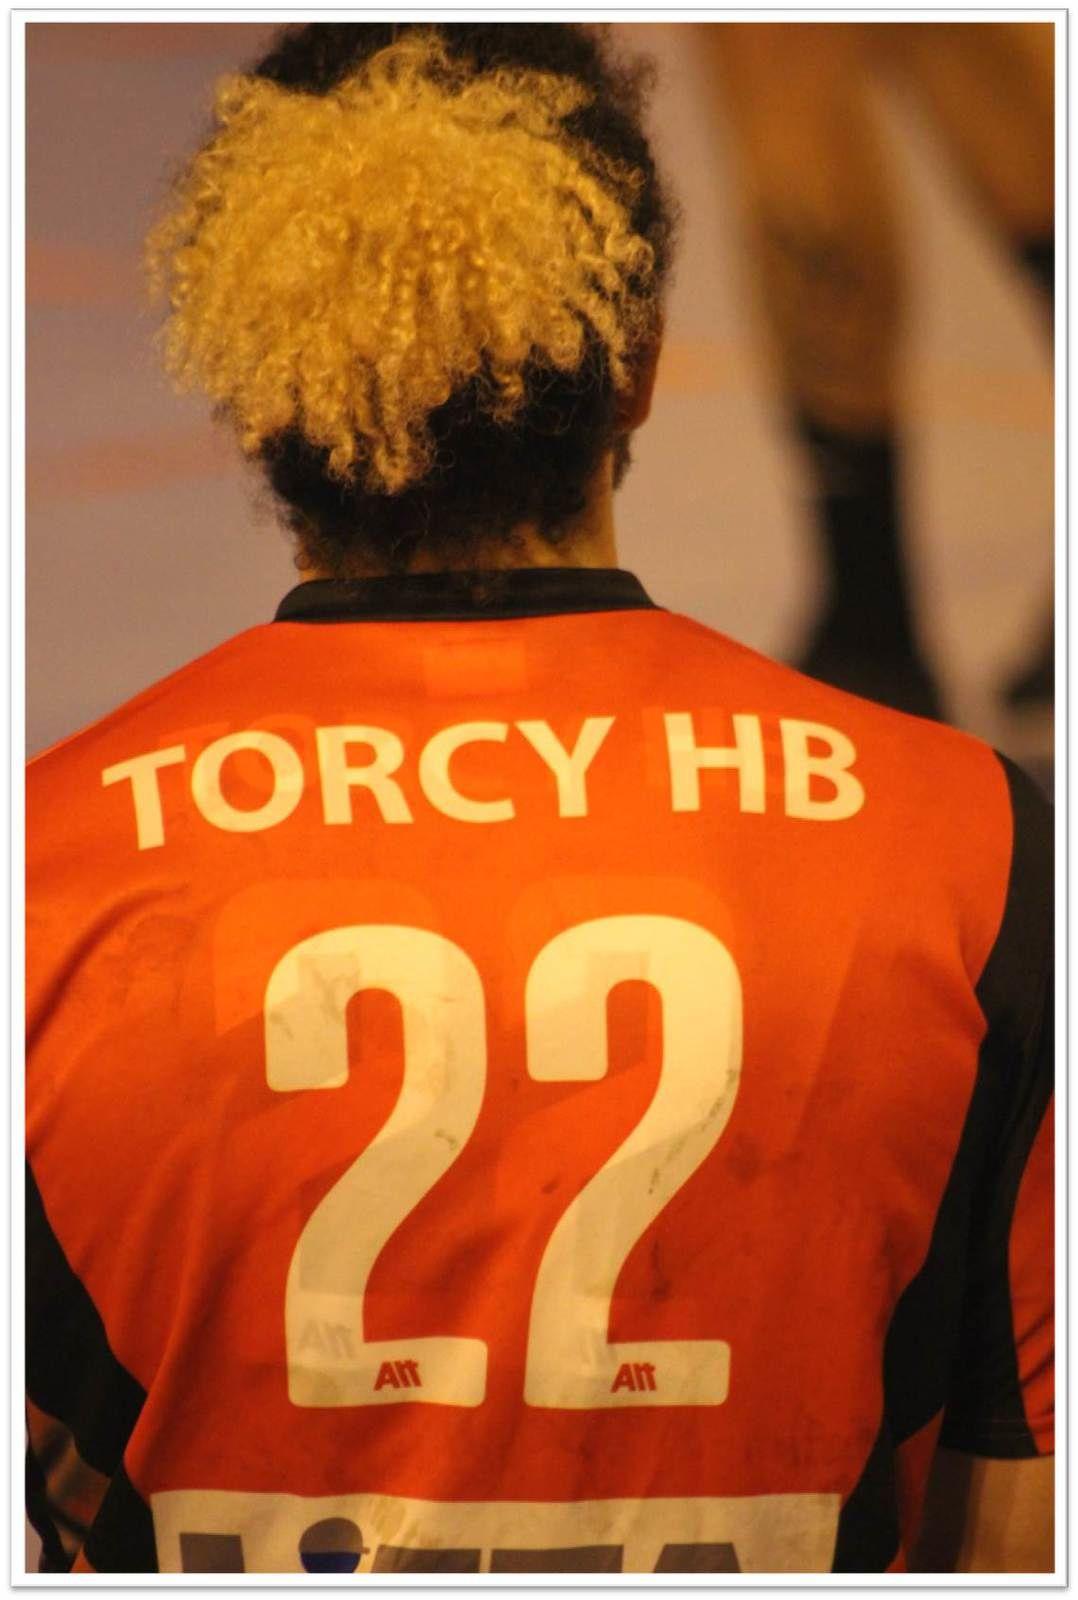 THBMLV 1 vs LIVRY-GARGAN (Prépa Séniors - 04.11.2015)